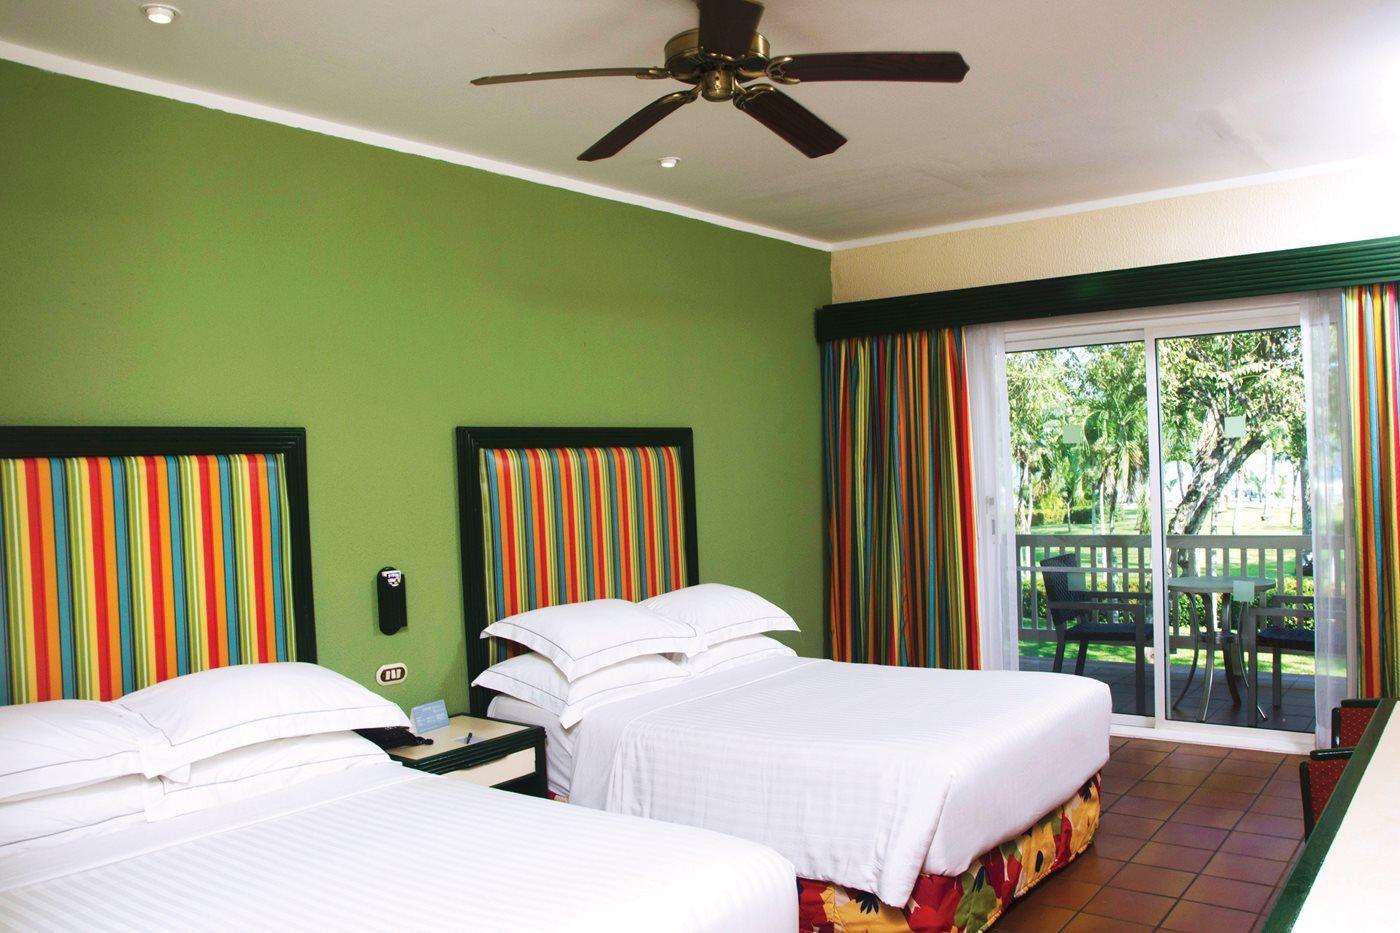 All inclusive resort Barceló Tambor Hotel, Playa Tambor in Costa Rica